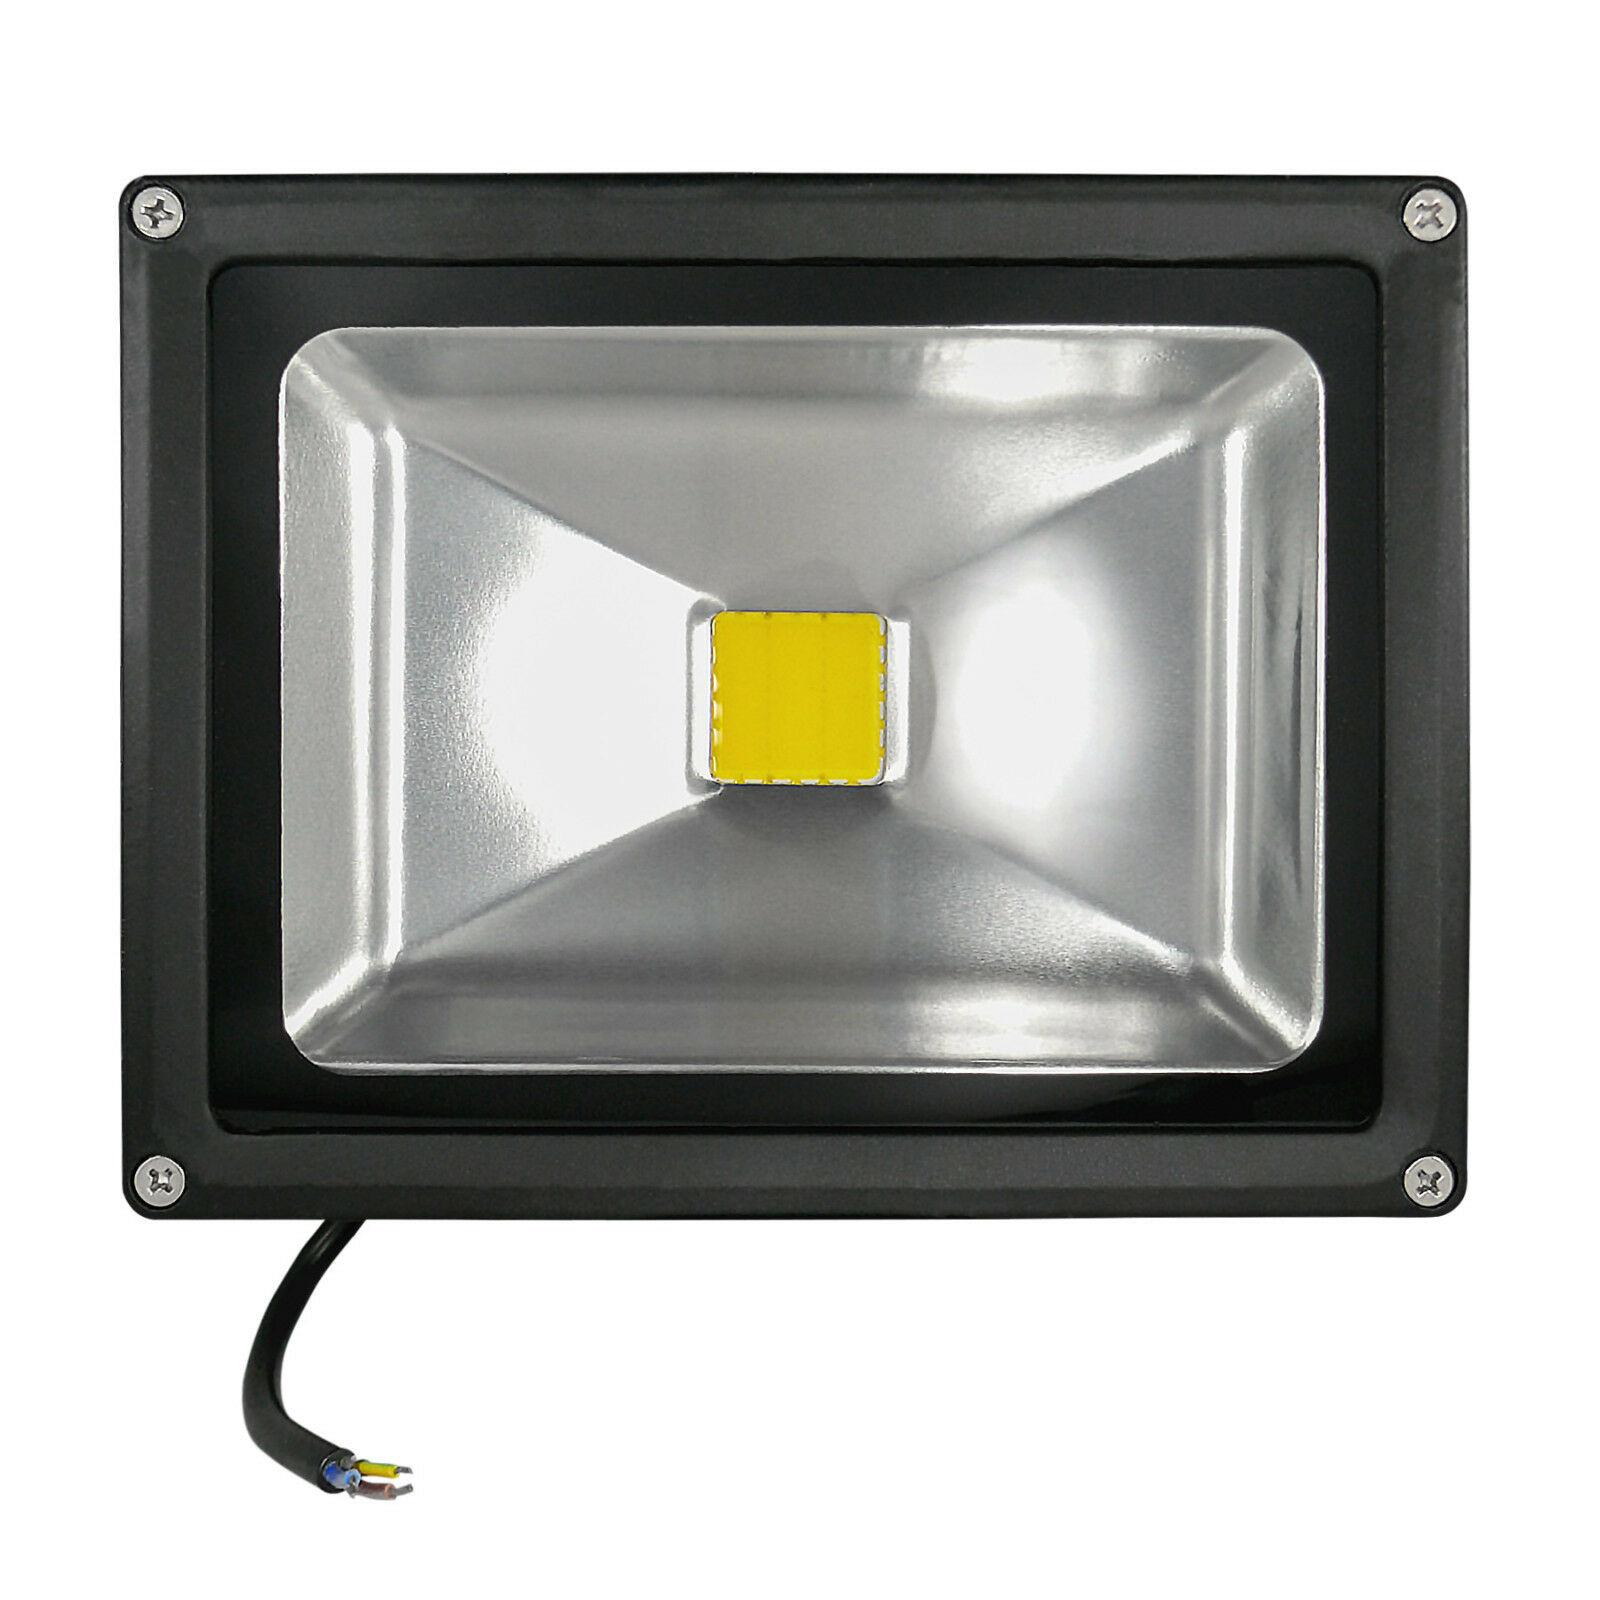 10x LED Fluter LED Flutlicht LED Strahler IP65 50 Watt värmaweiß